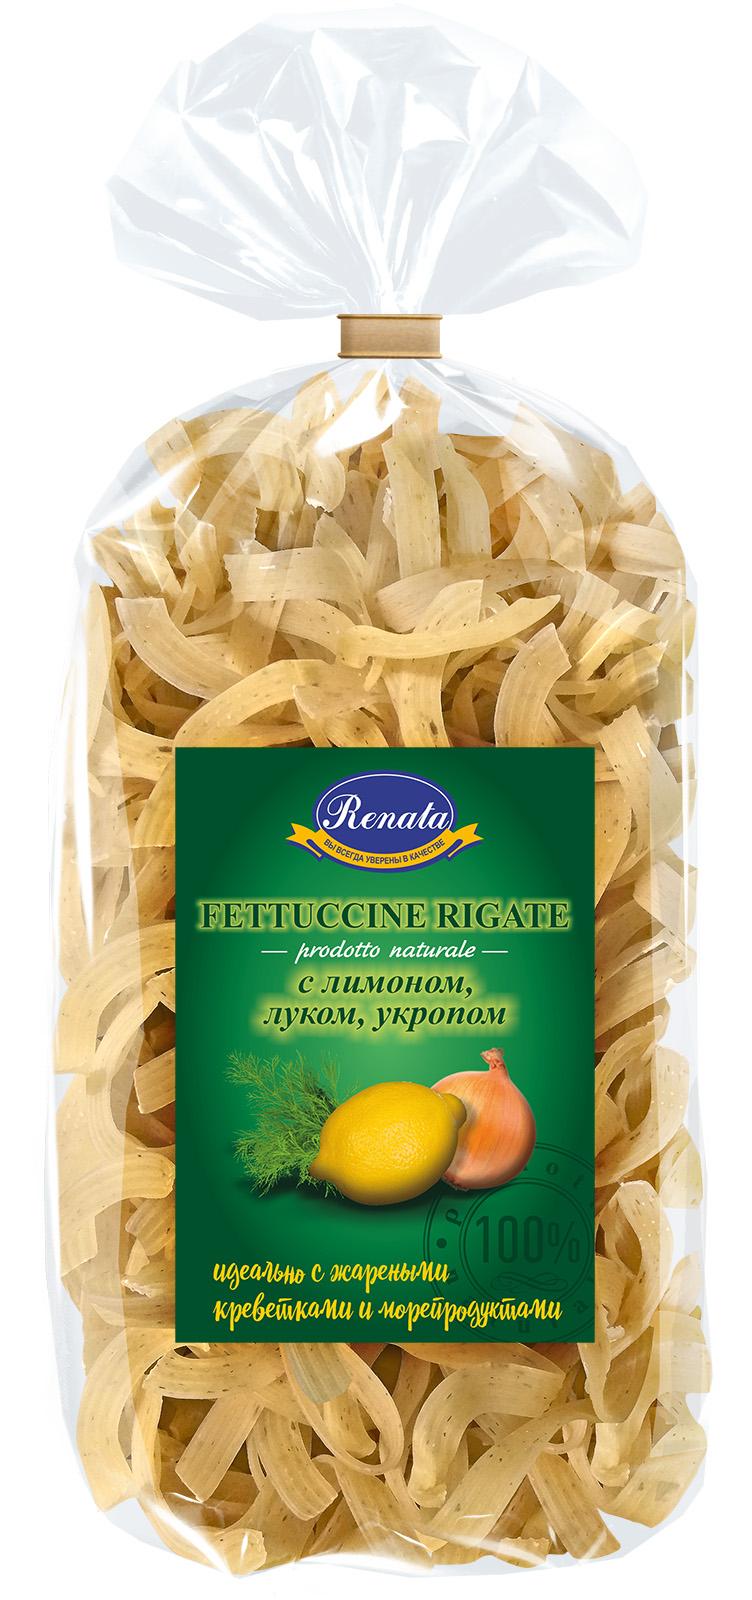 Макароны «Renata» Fettuccine rigate лапша рифленая с лимоном луком и укропом, 350